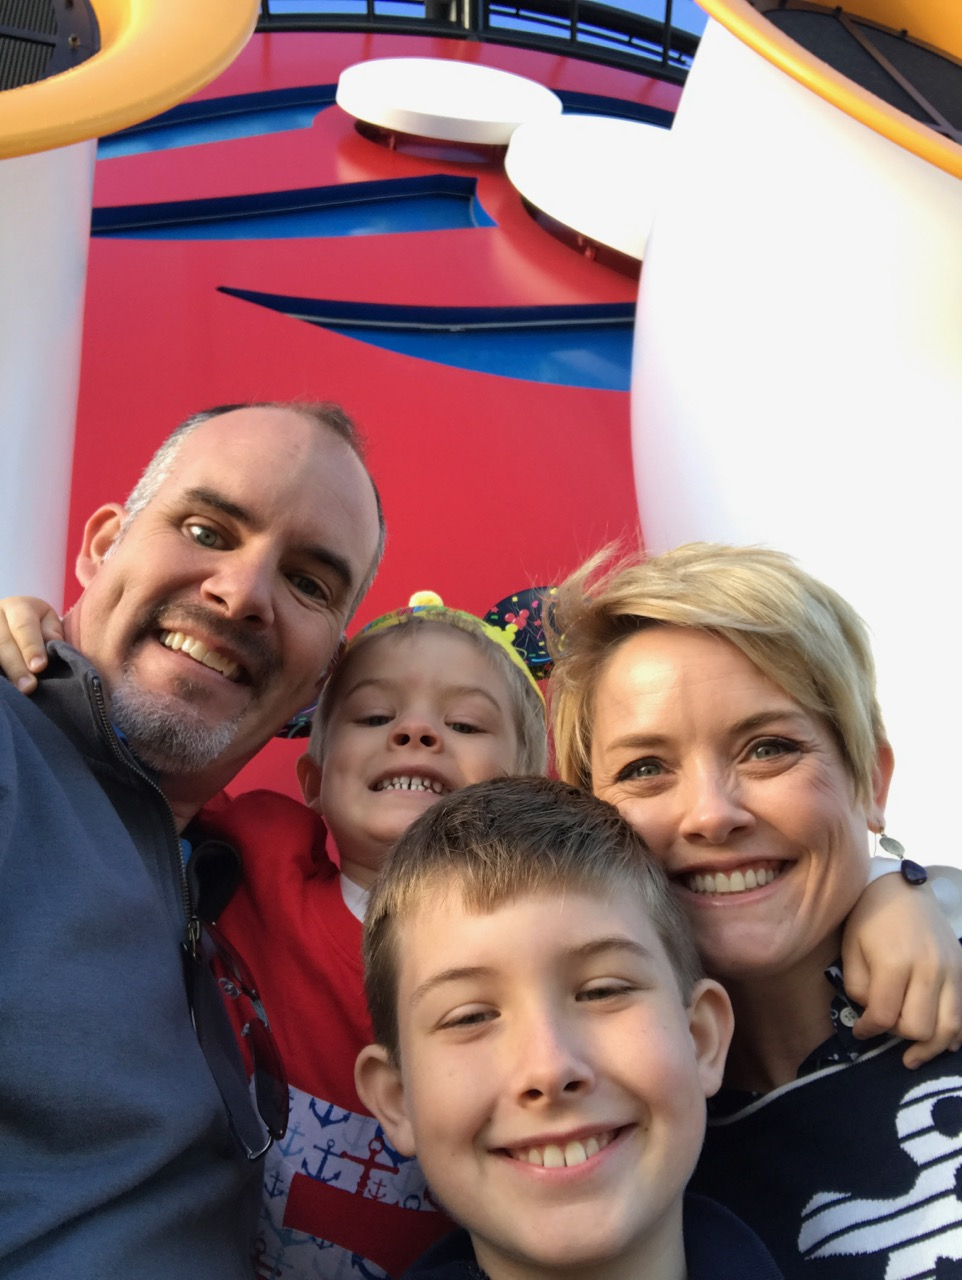 Disney Dream Smokestack Birthday Selfie